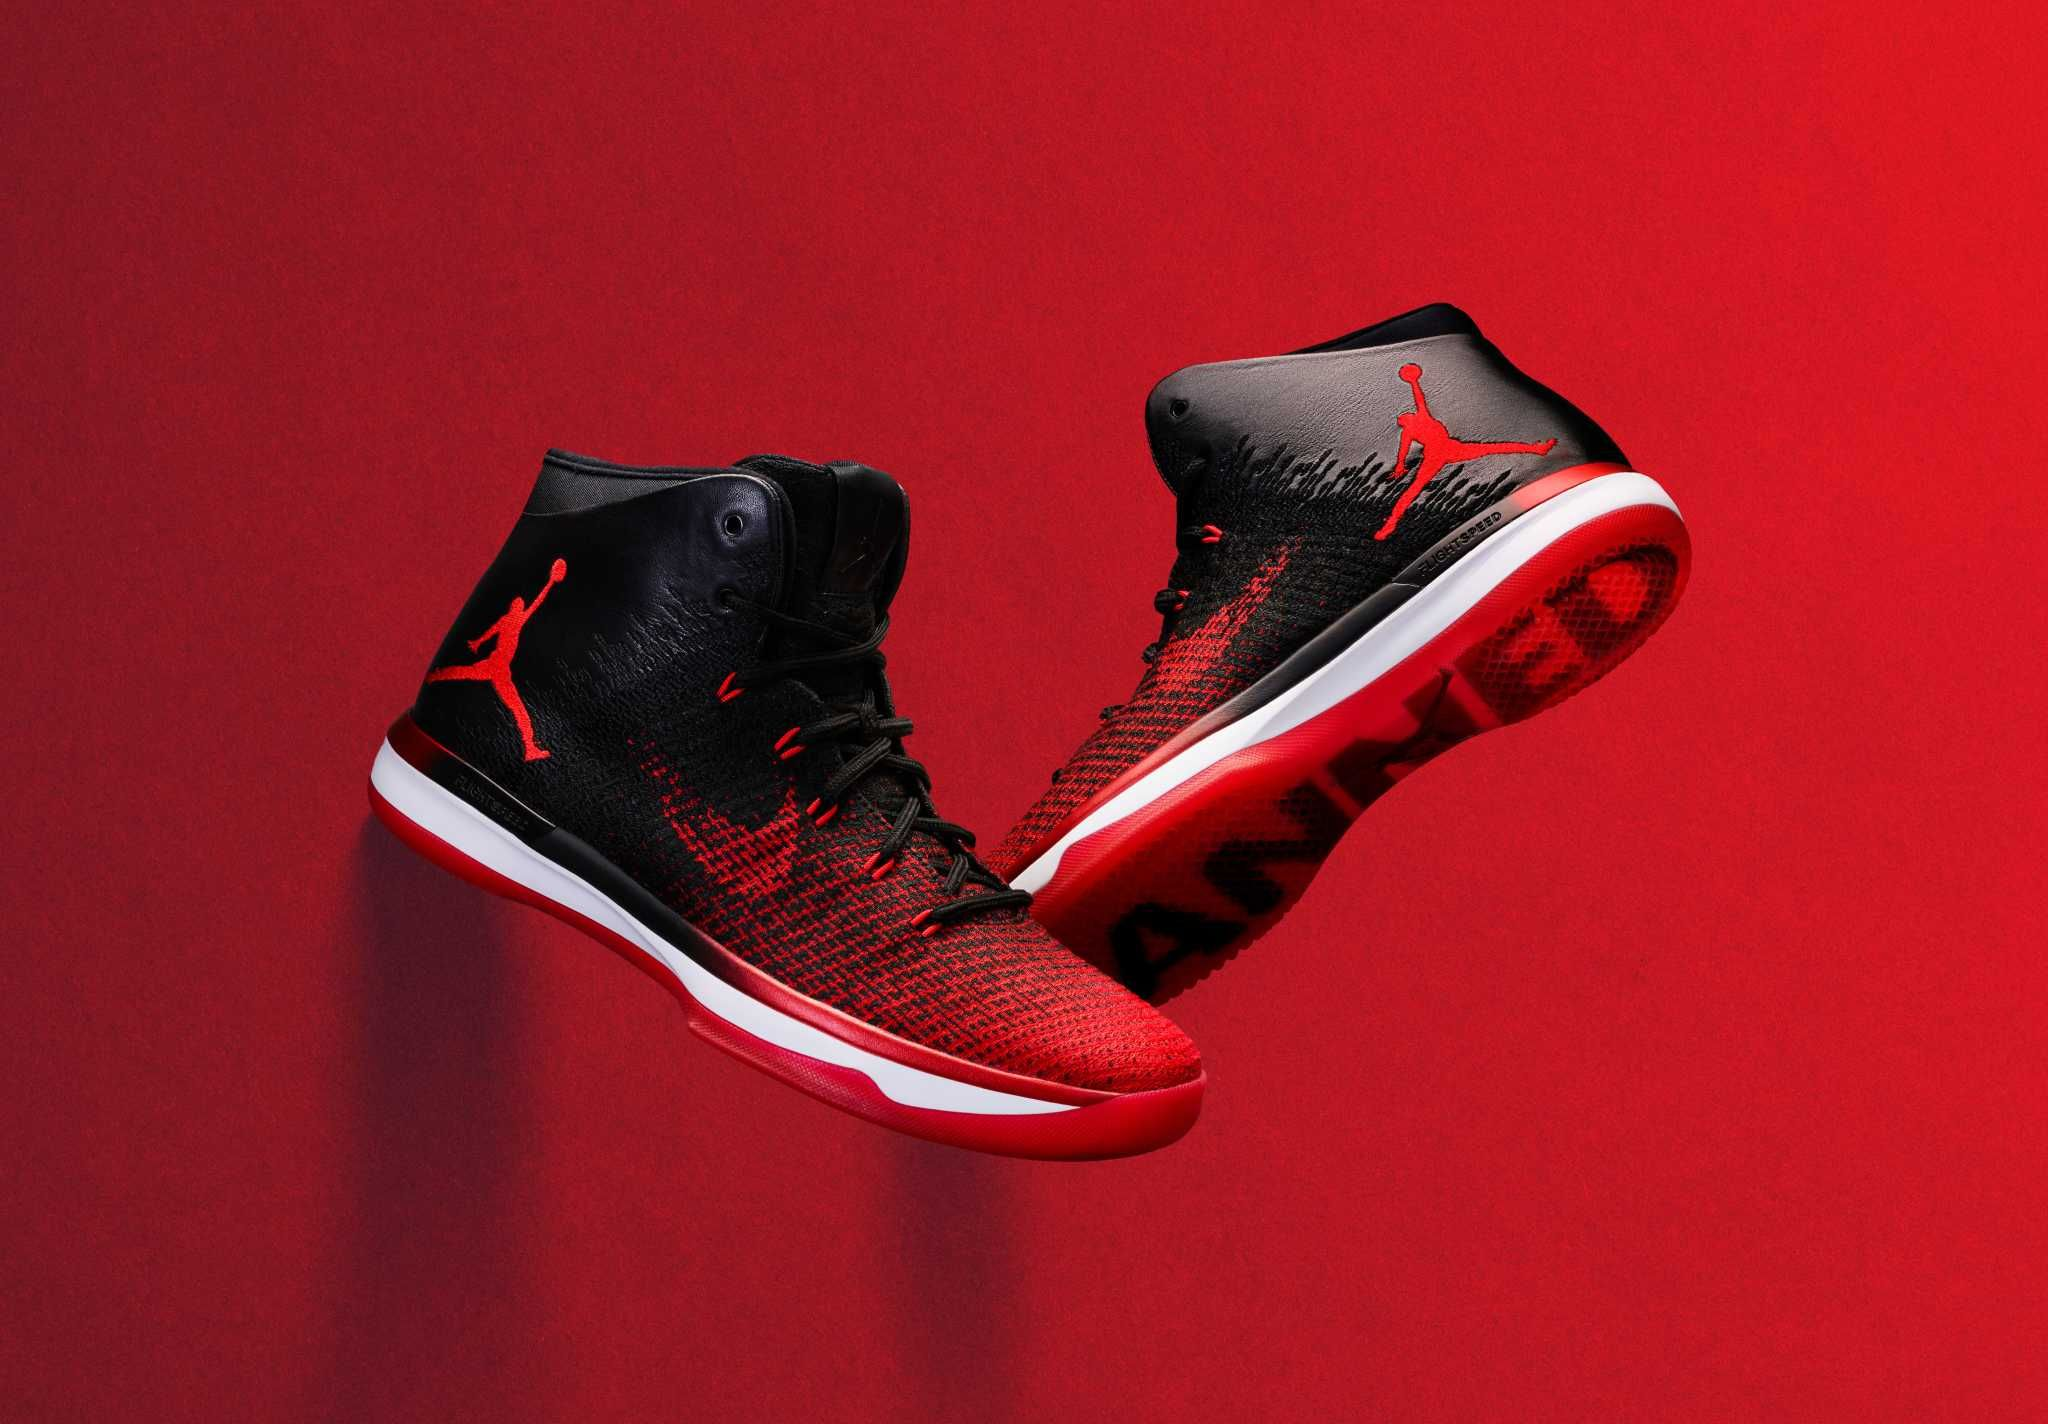 0ba88fa5d402 Jordan Brand Takes the Wraps Off the Air Jordan 31